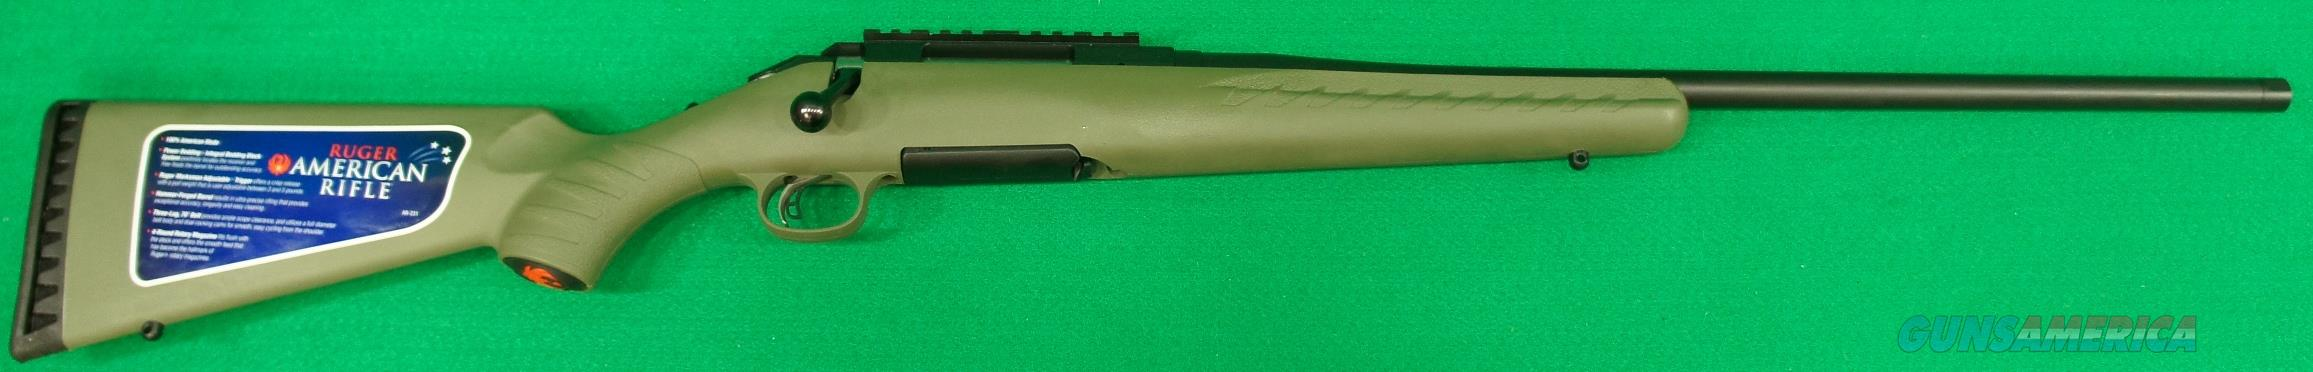 American Rifle Predator 22-250Rem 22In  6945  Guns > Rifles > Ruger Rifles > American Rifle